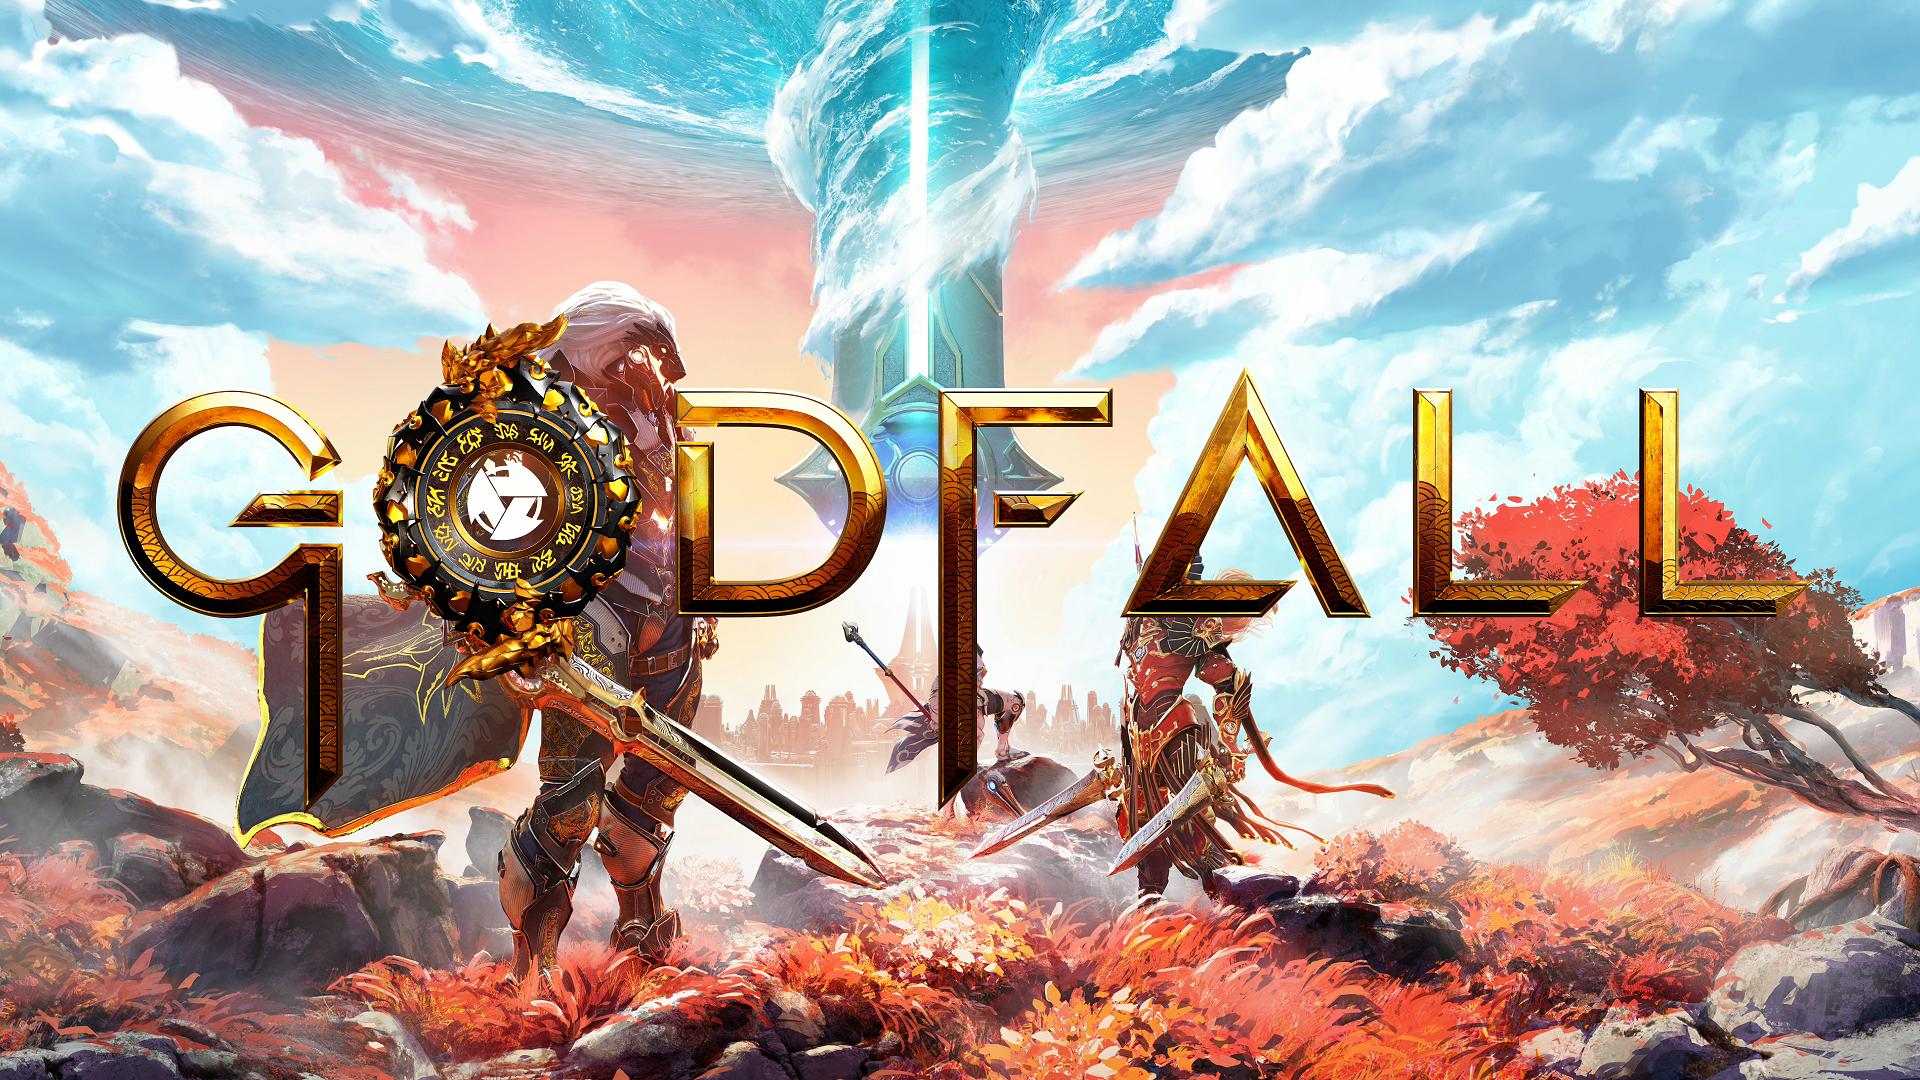 Godfall Ps5 Review In Progress Looter Slasher Mediocre Blockbuster